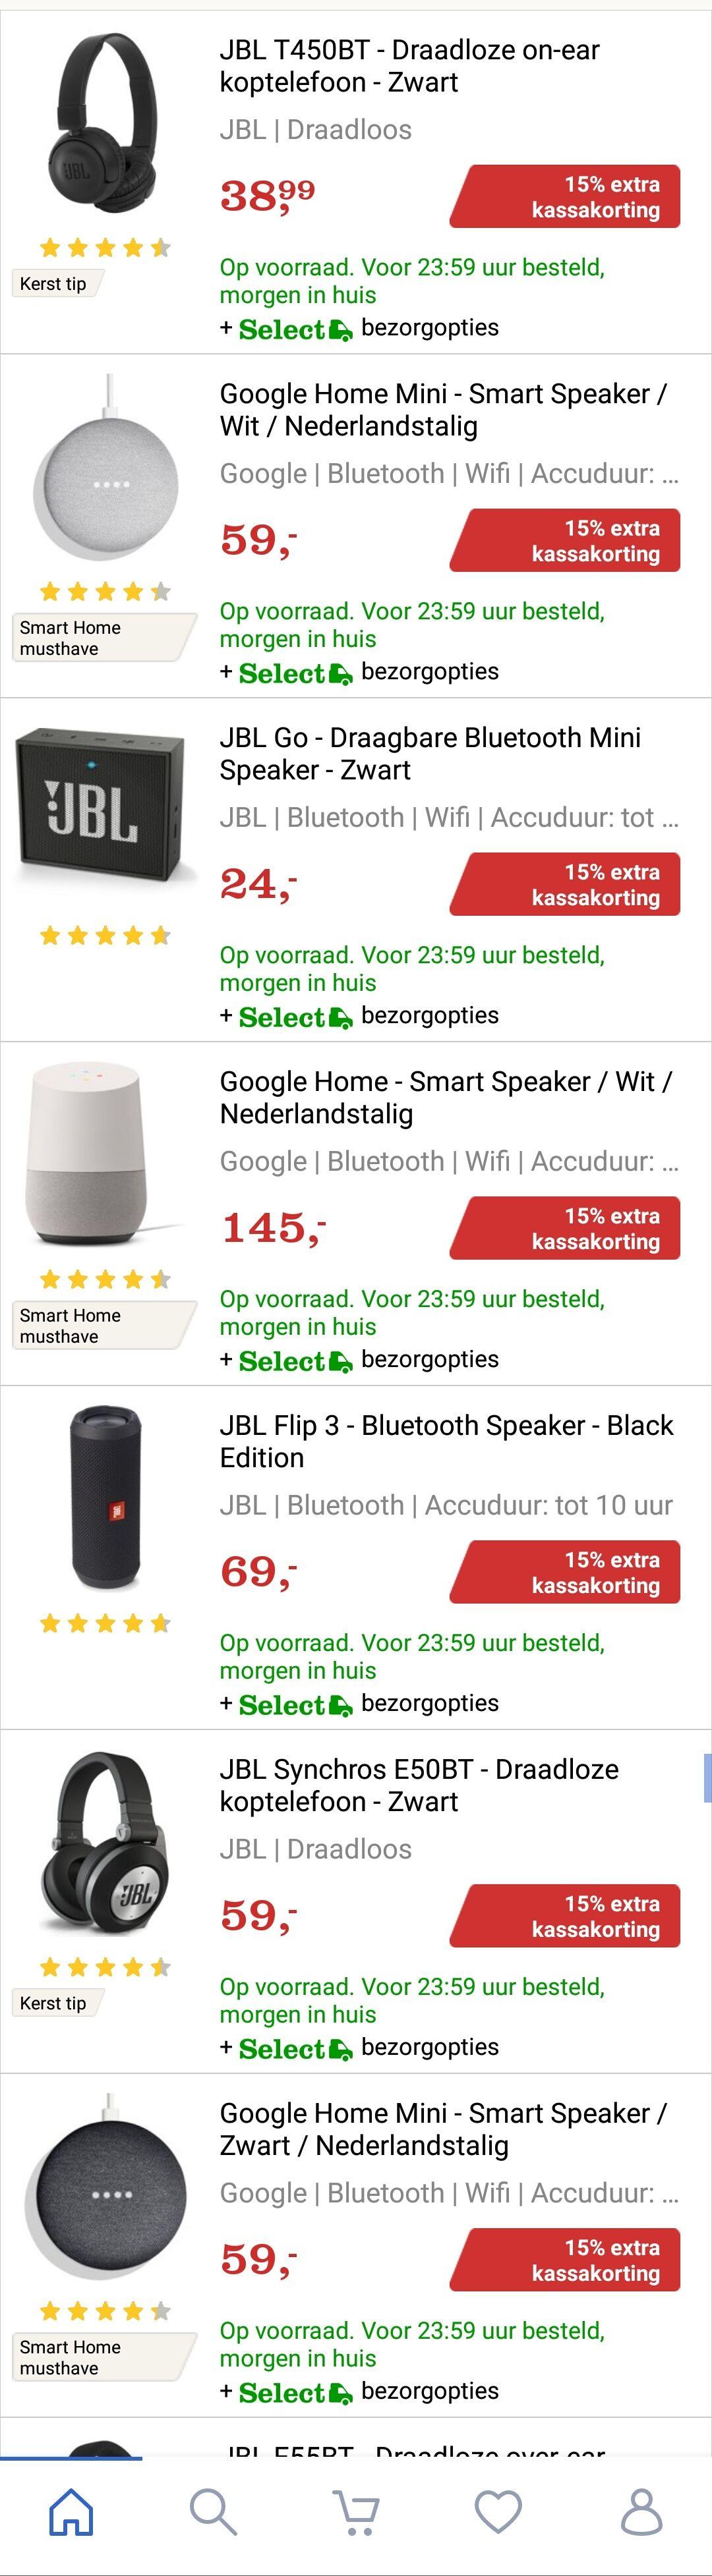 Dagdeal bol.com: 15% korting op Audio & HIFI (Speakers & koptelefoons) oa JBL, Harman Kardon & Google Home.